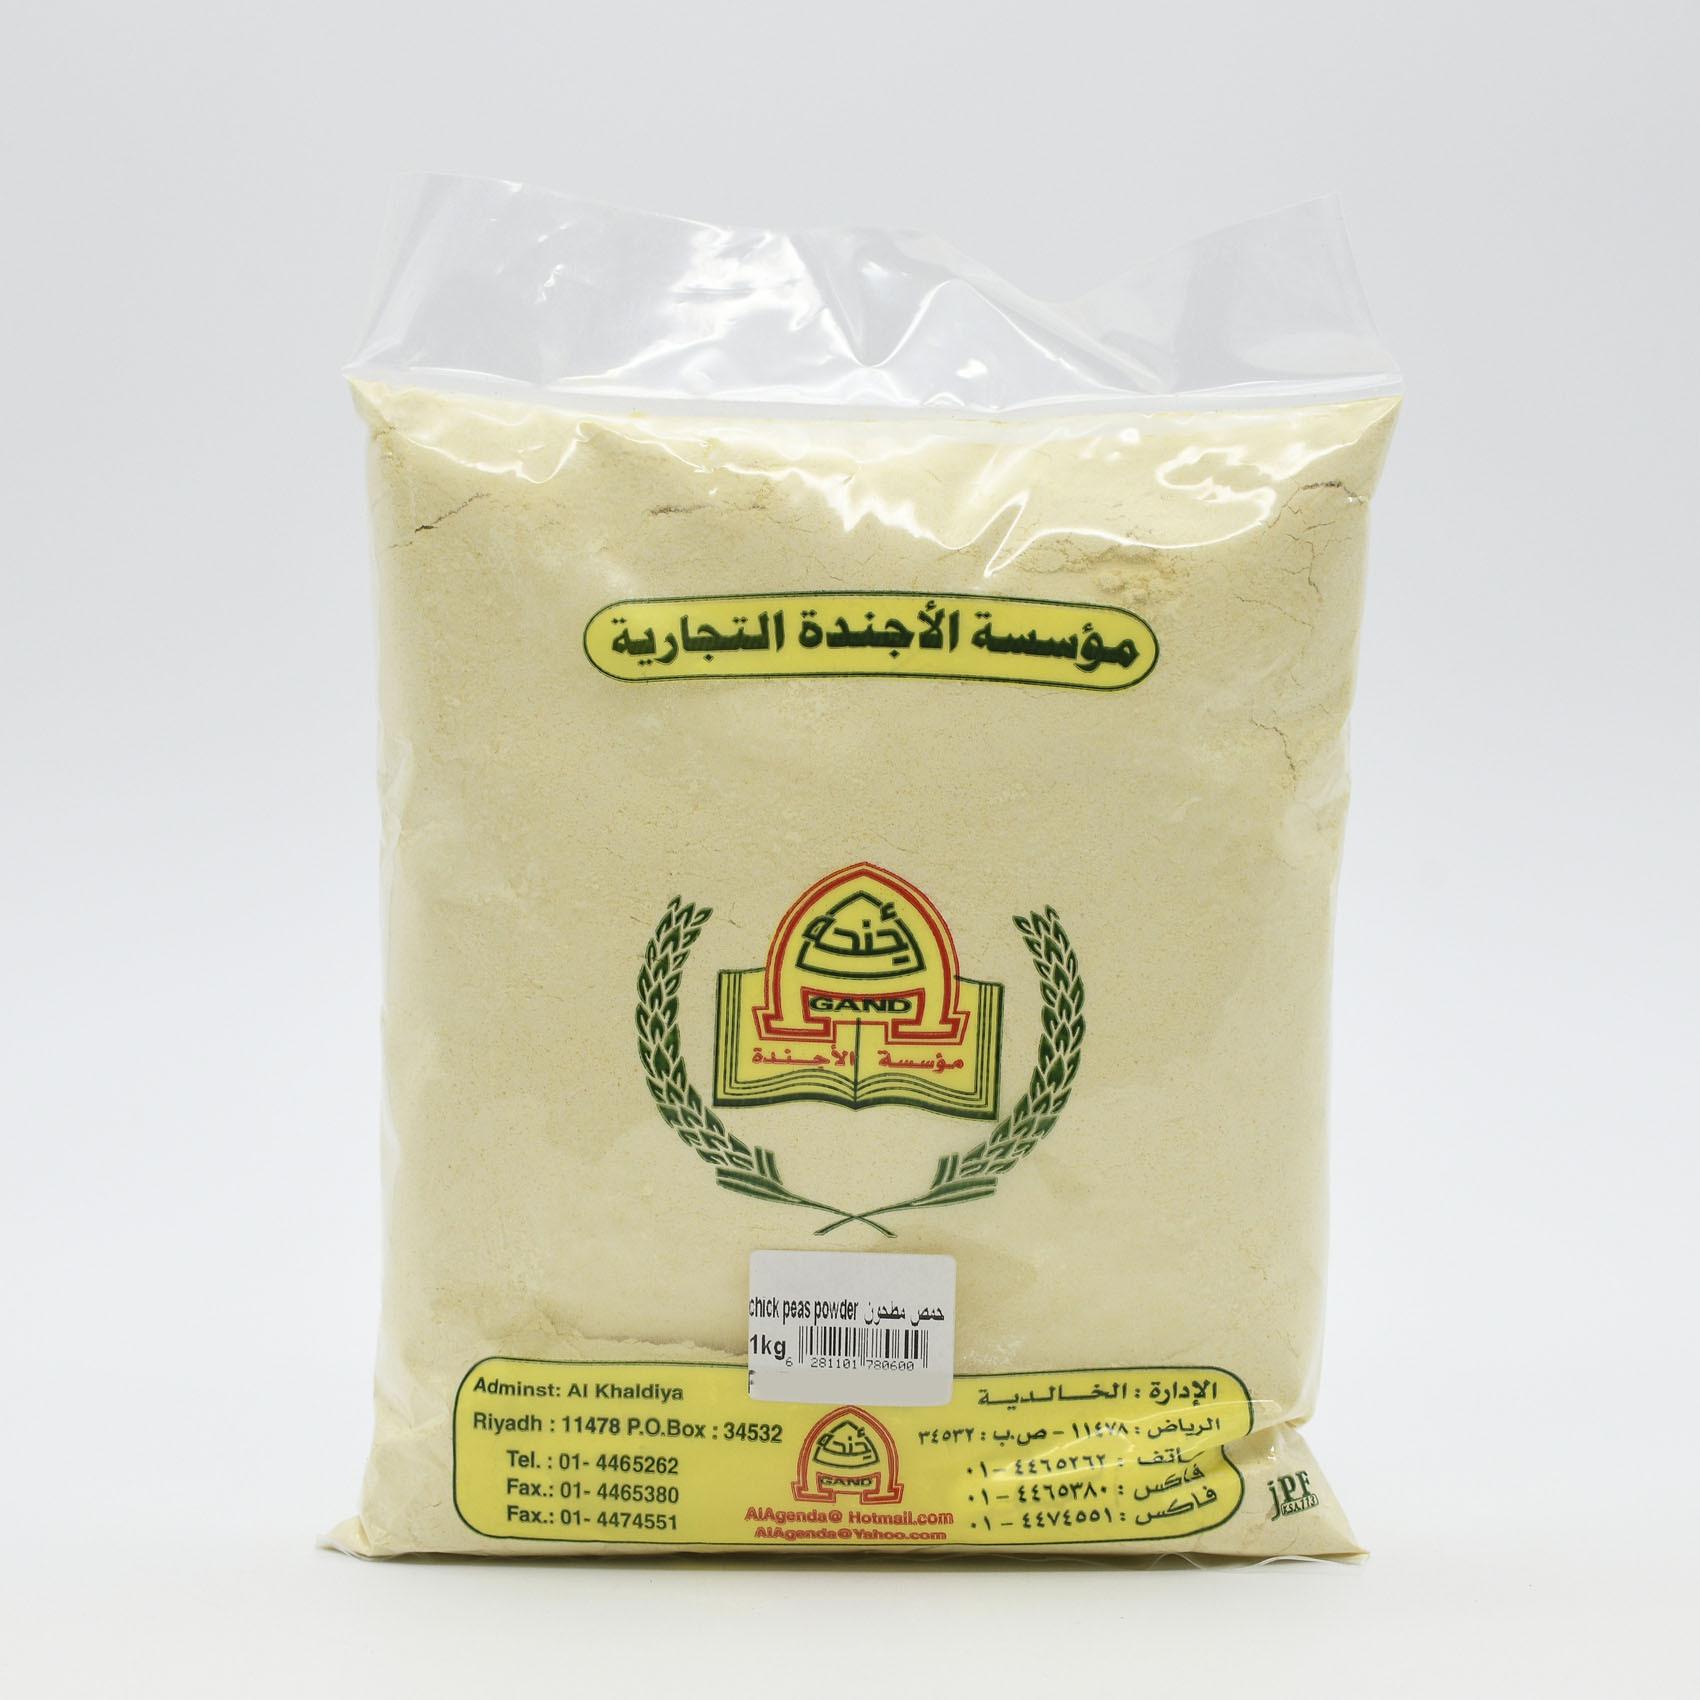 Buy Alagenda Chick Peas Powder 1 Kg Online Shop Food Cupboard On Carrefour Saudi Arabia